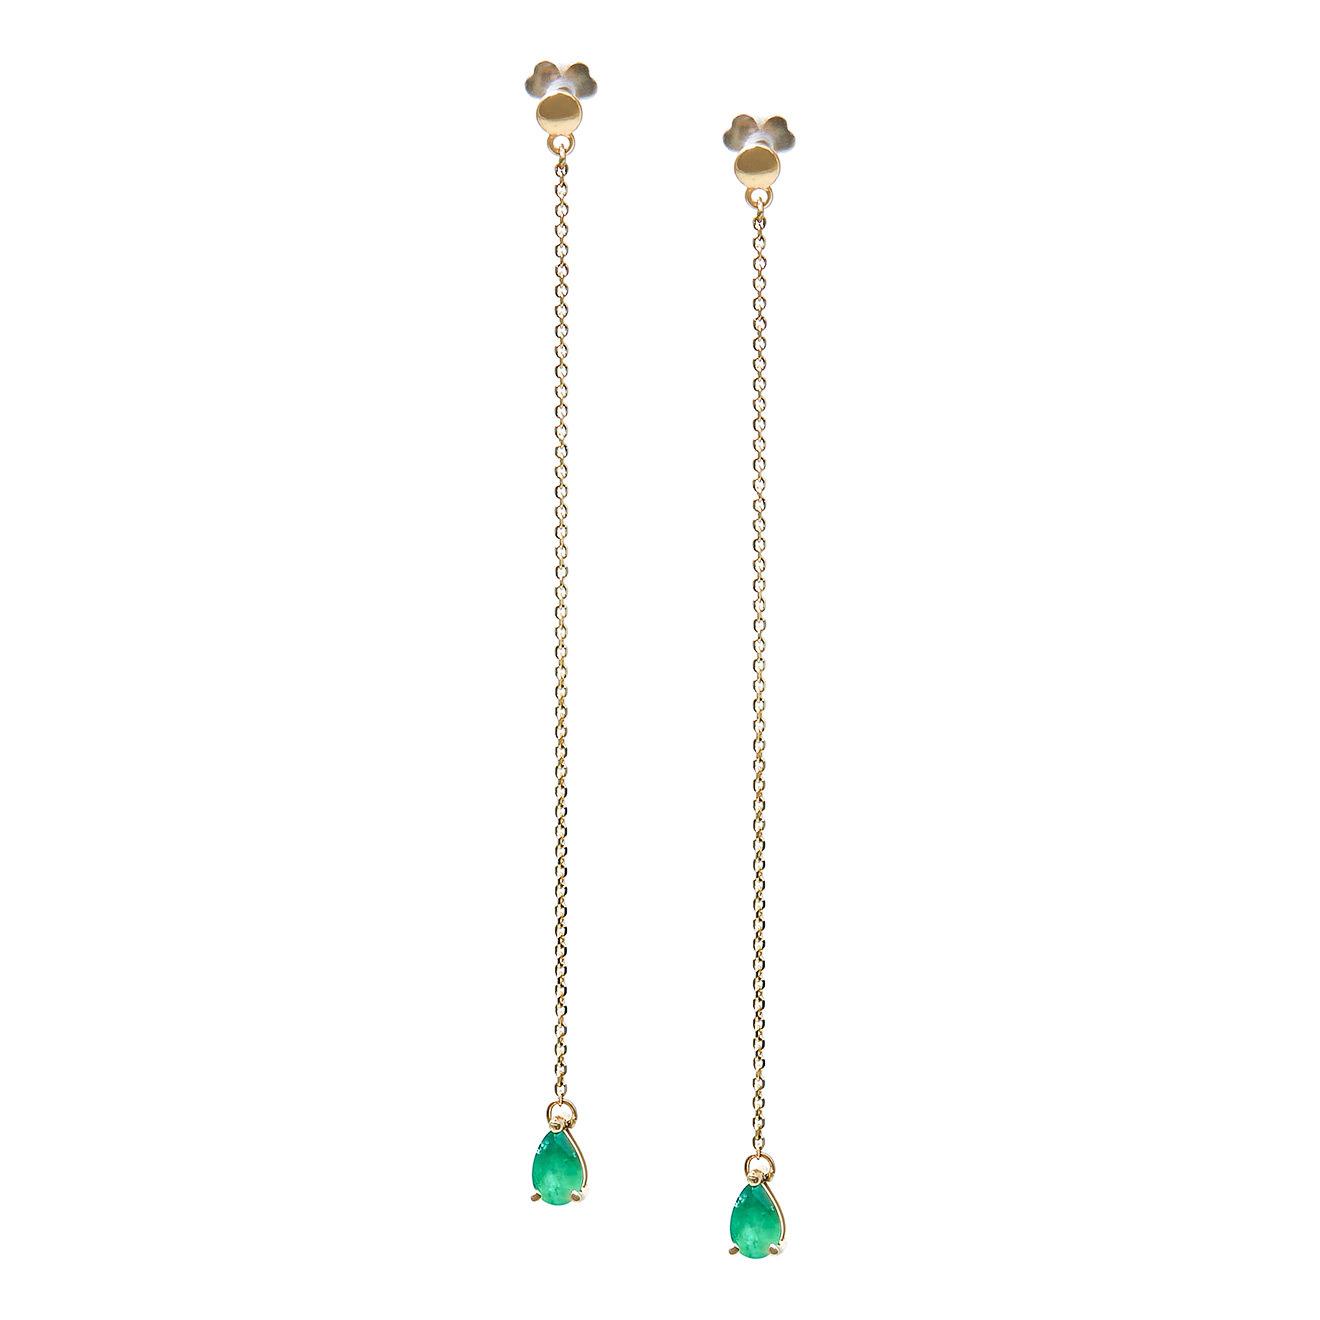 Herald Percy Diamonds Серьги-дорожки из золота с изумрудами